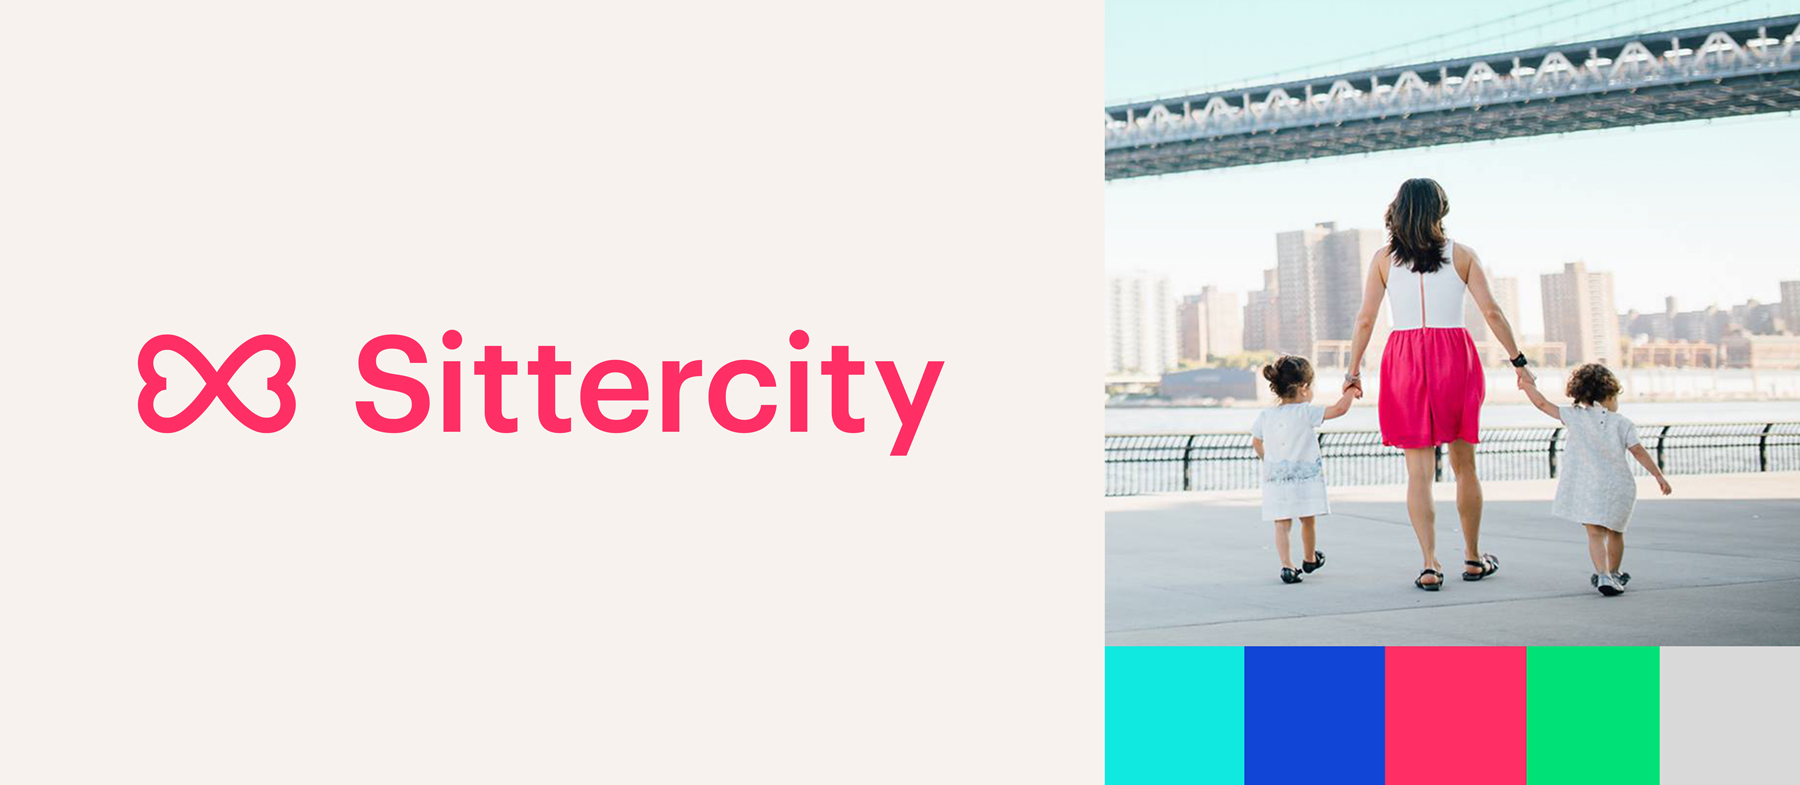 Sittercity Maiocco Design Co.